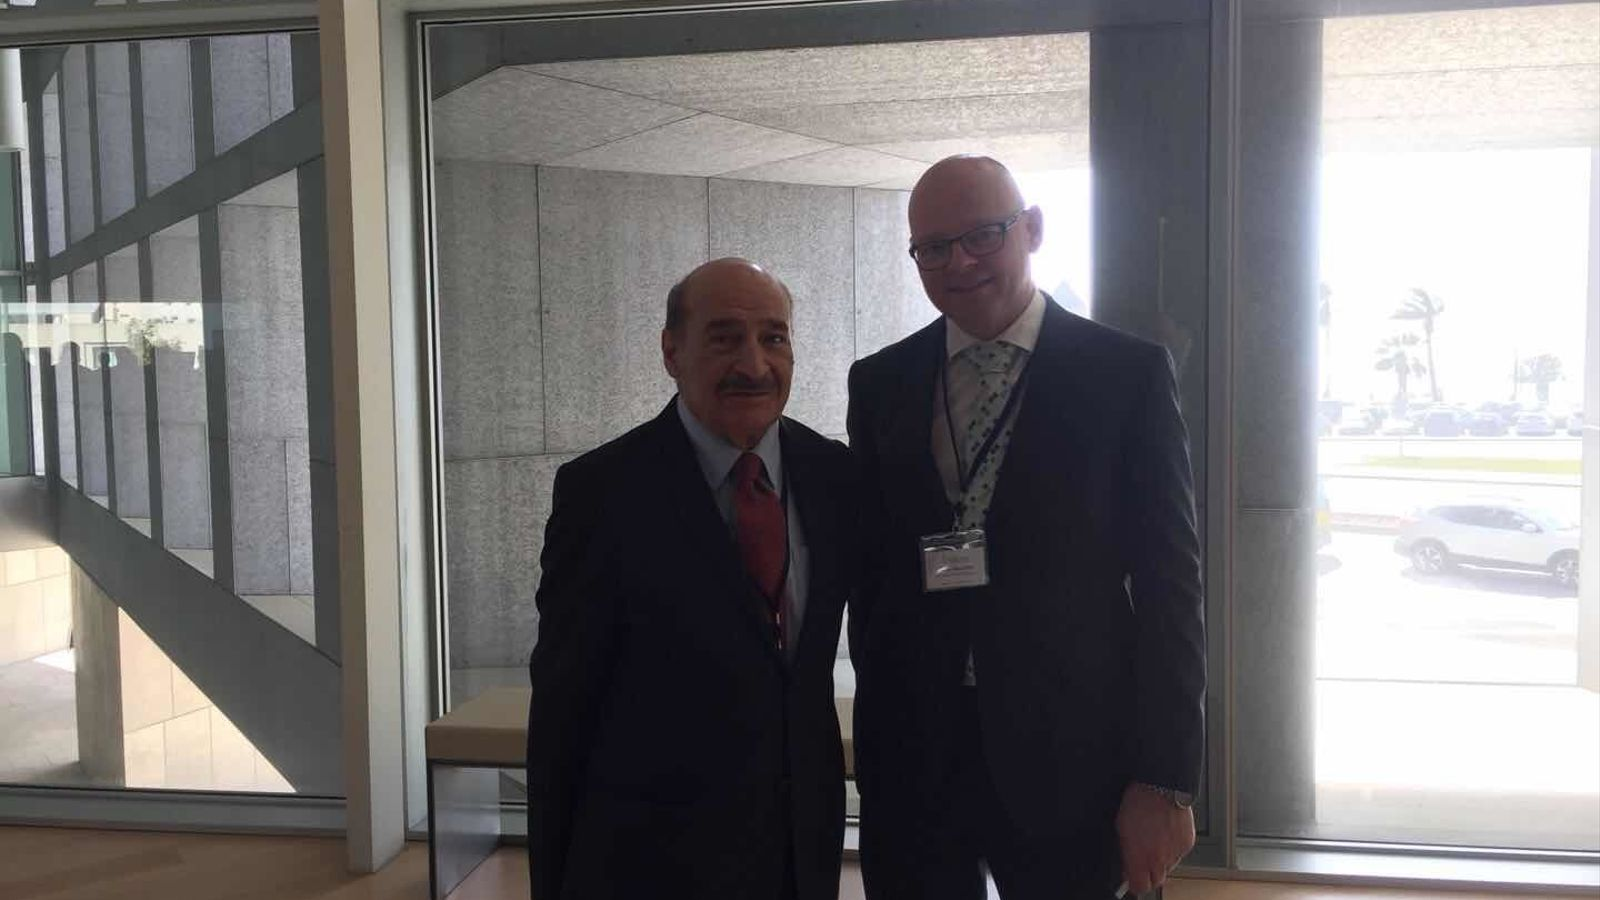 Jafar Jafari, dreta, i Antoni Riera al Fòrum d'Intel·ligència Turística del 2018, a Palma